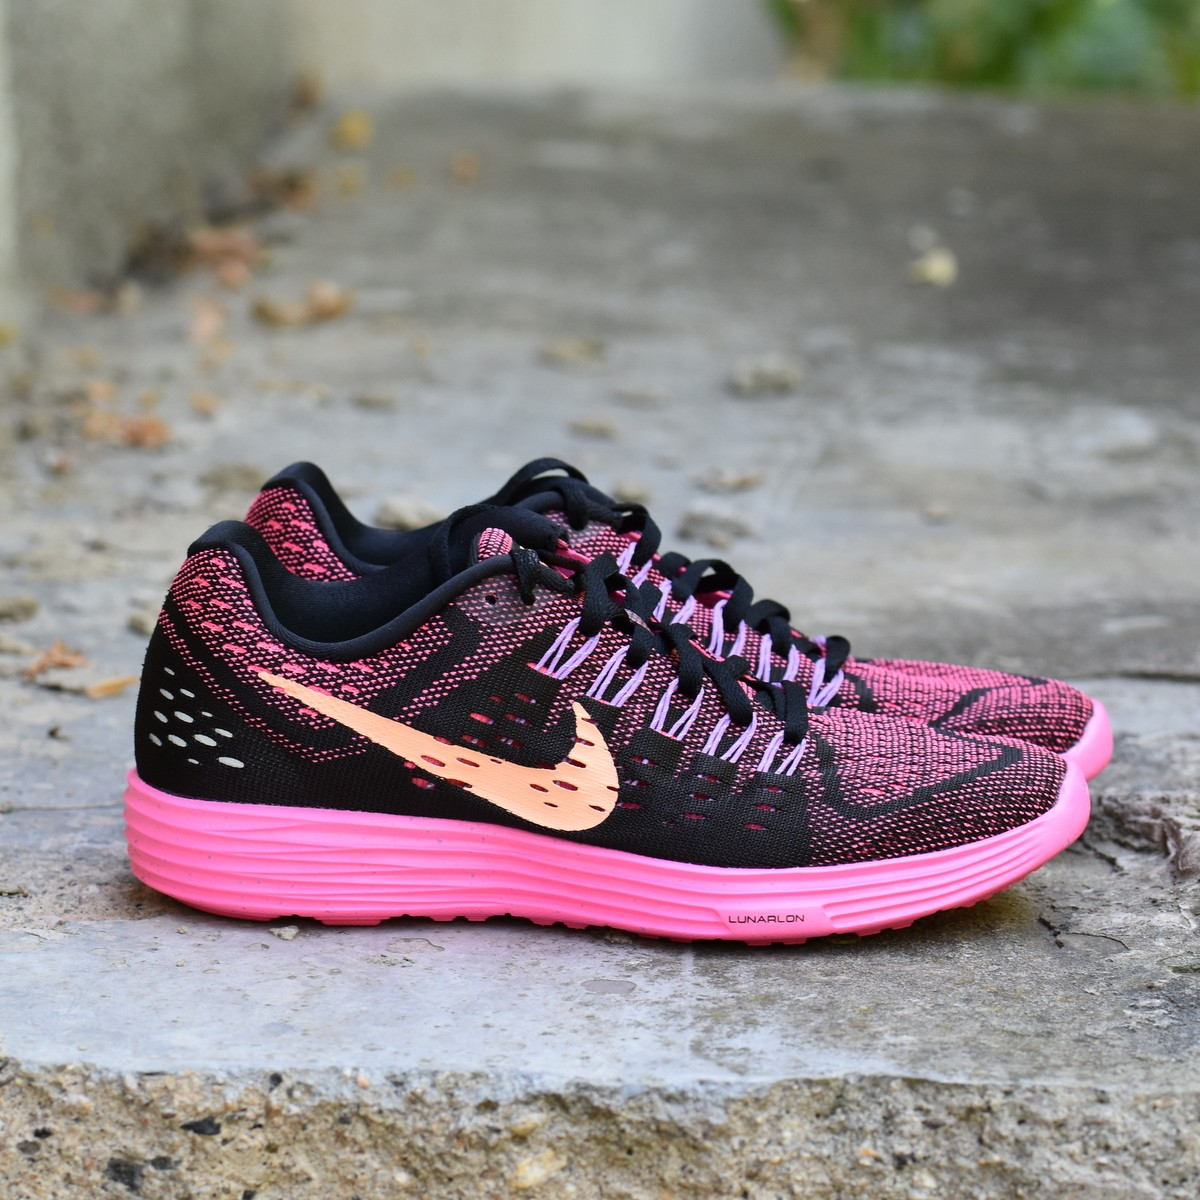 Nike WMNS LUNARTEMPO Dámské boty EU 36 705462-008 7fa1b103d3